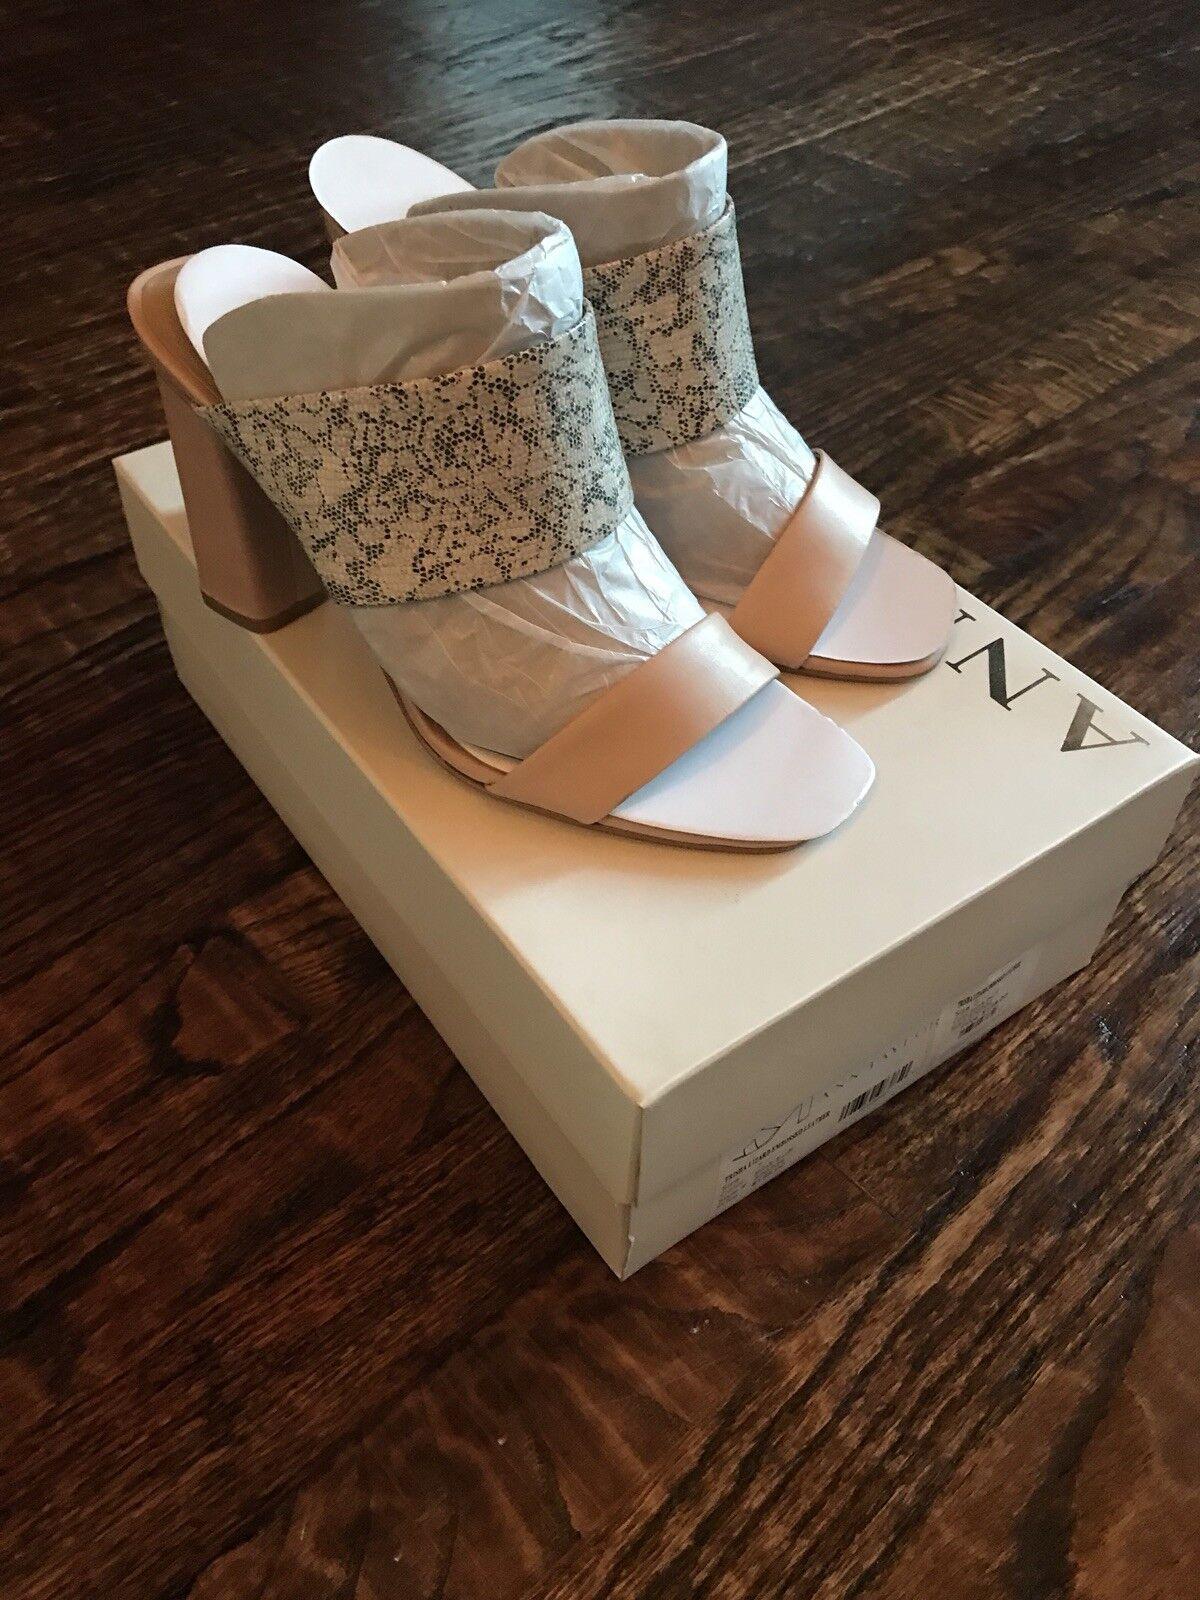 Ann Taylor Trisha Lizard Embossed Leather Heels Pink Buff Size 7 New In Box